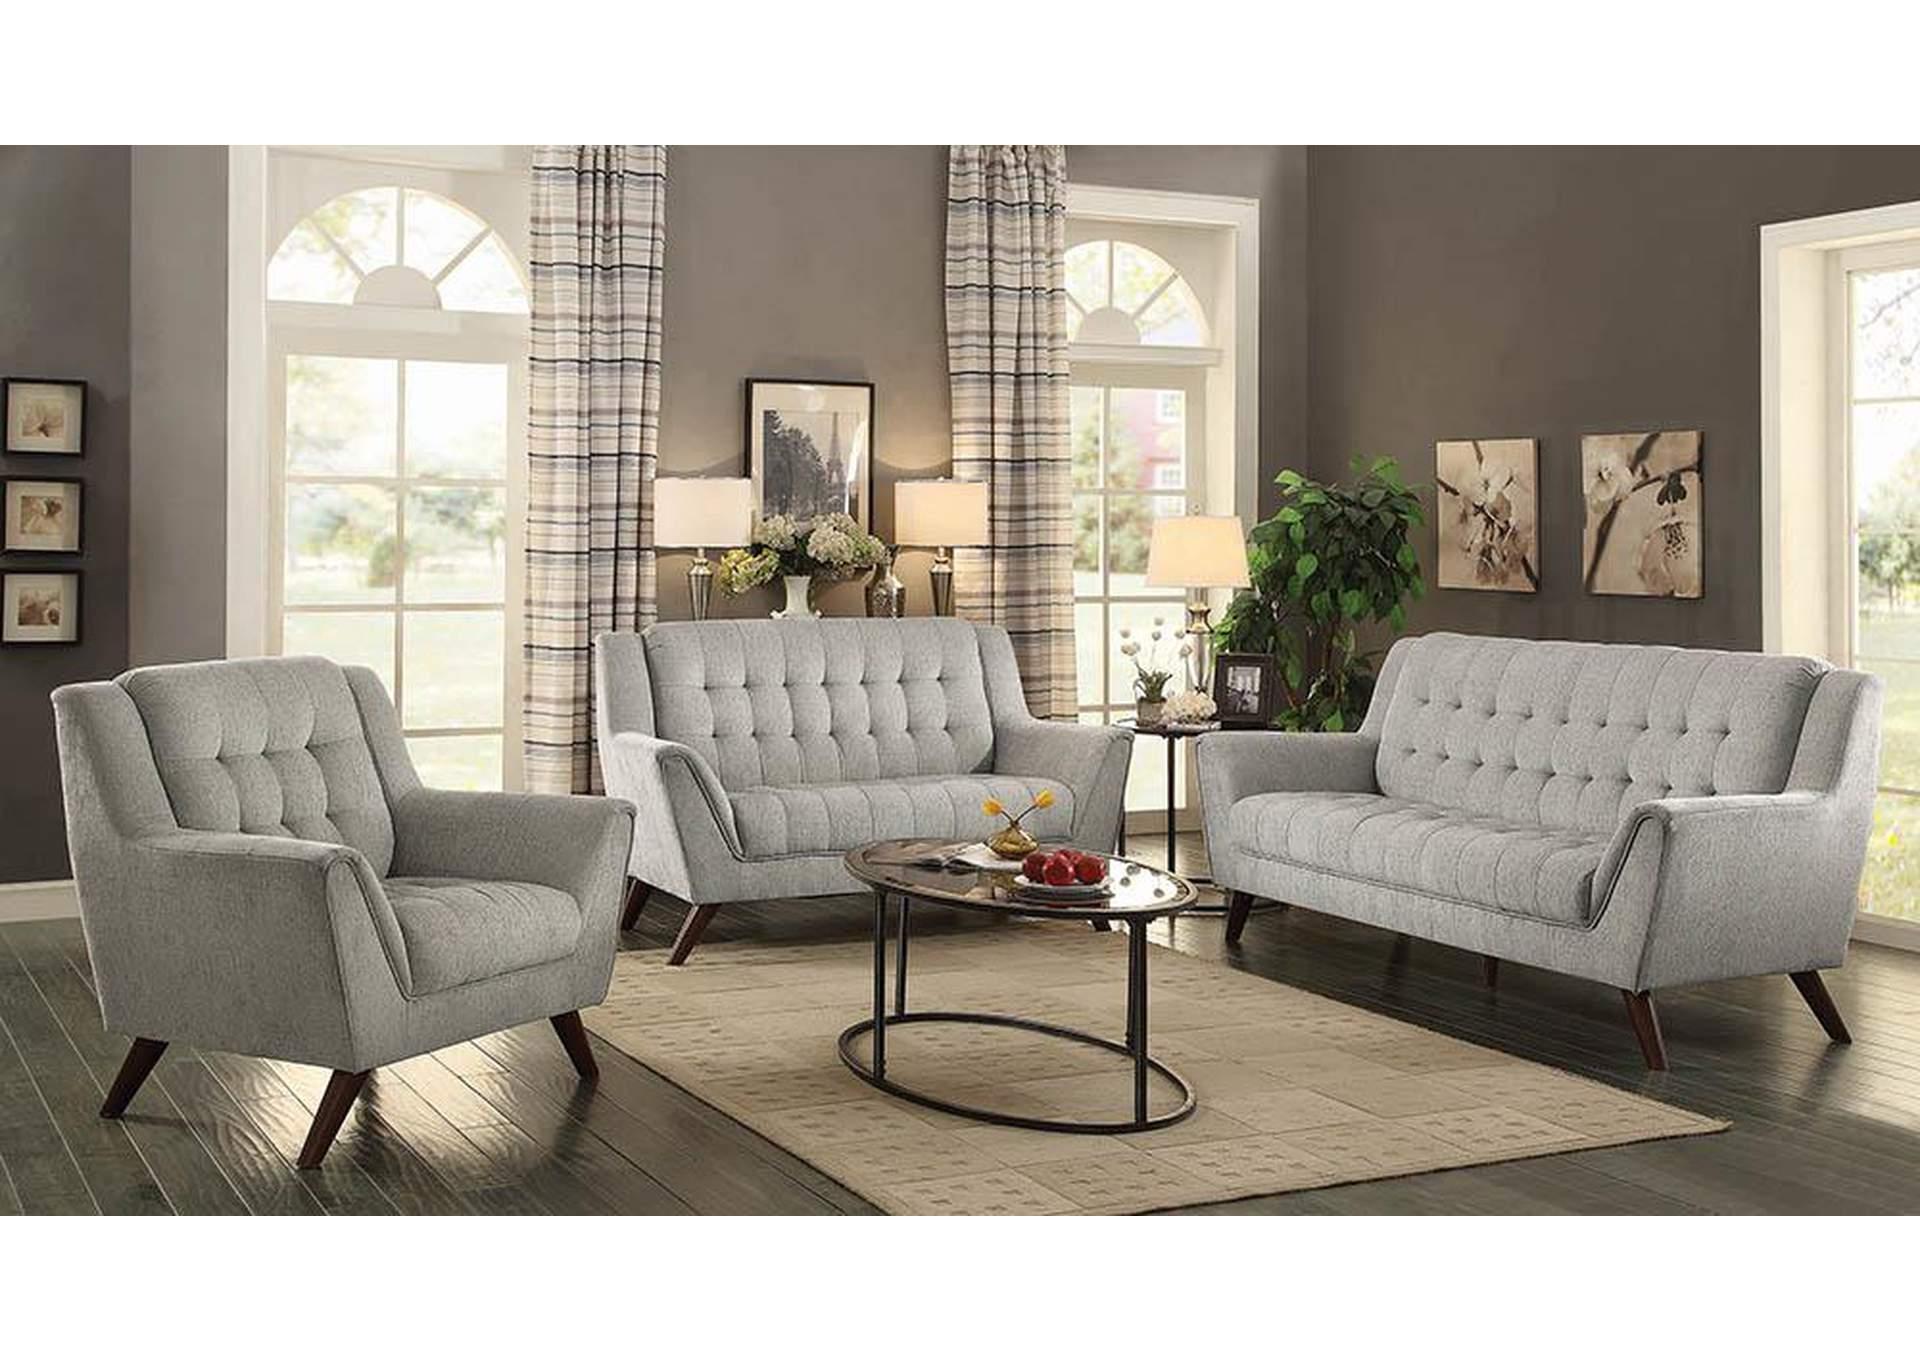 Baby Natalia Dove Grey Loveseat,Coaster Furniture